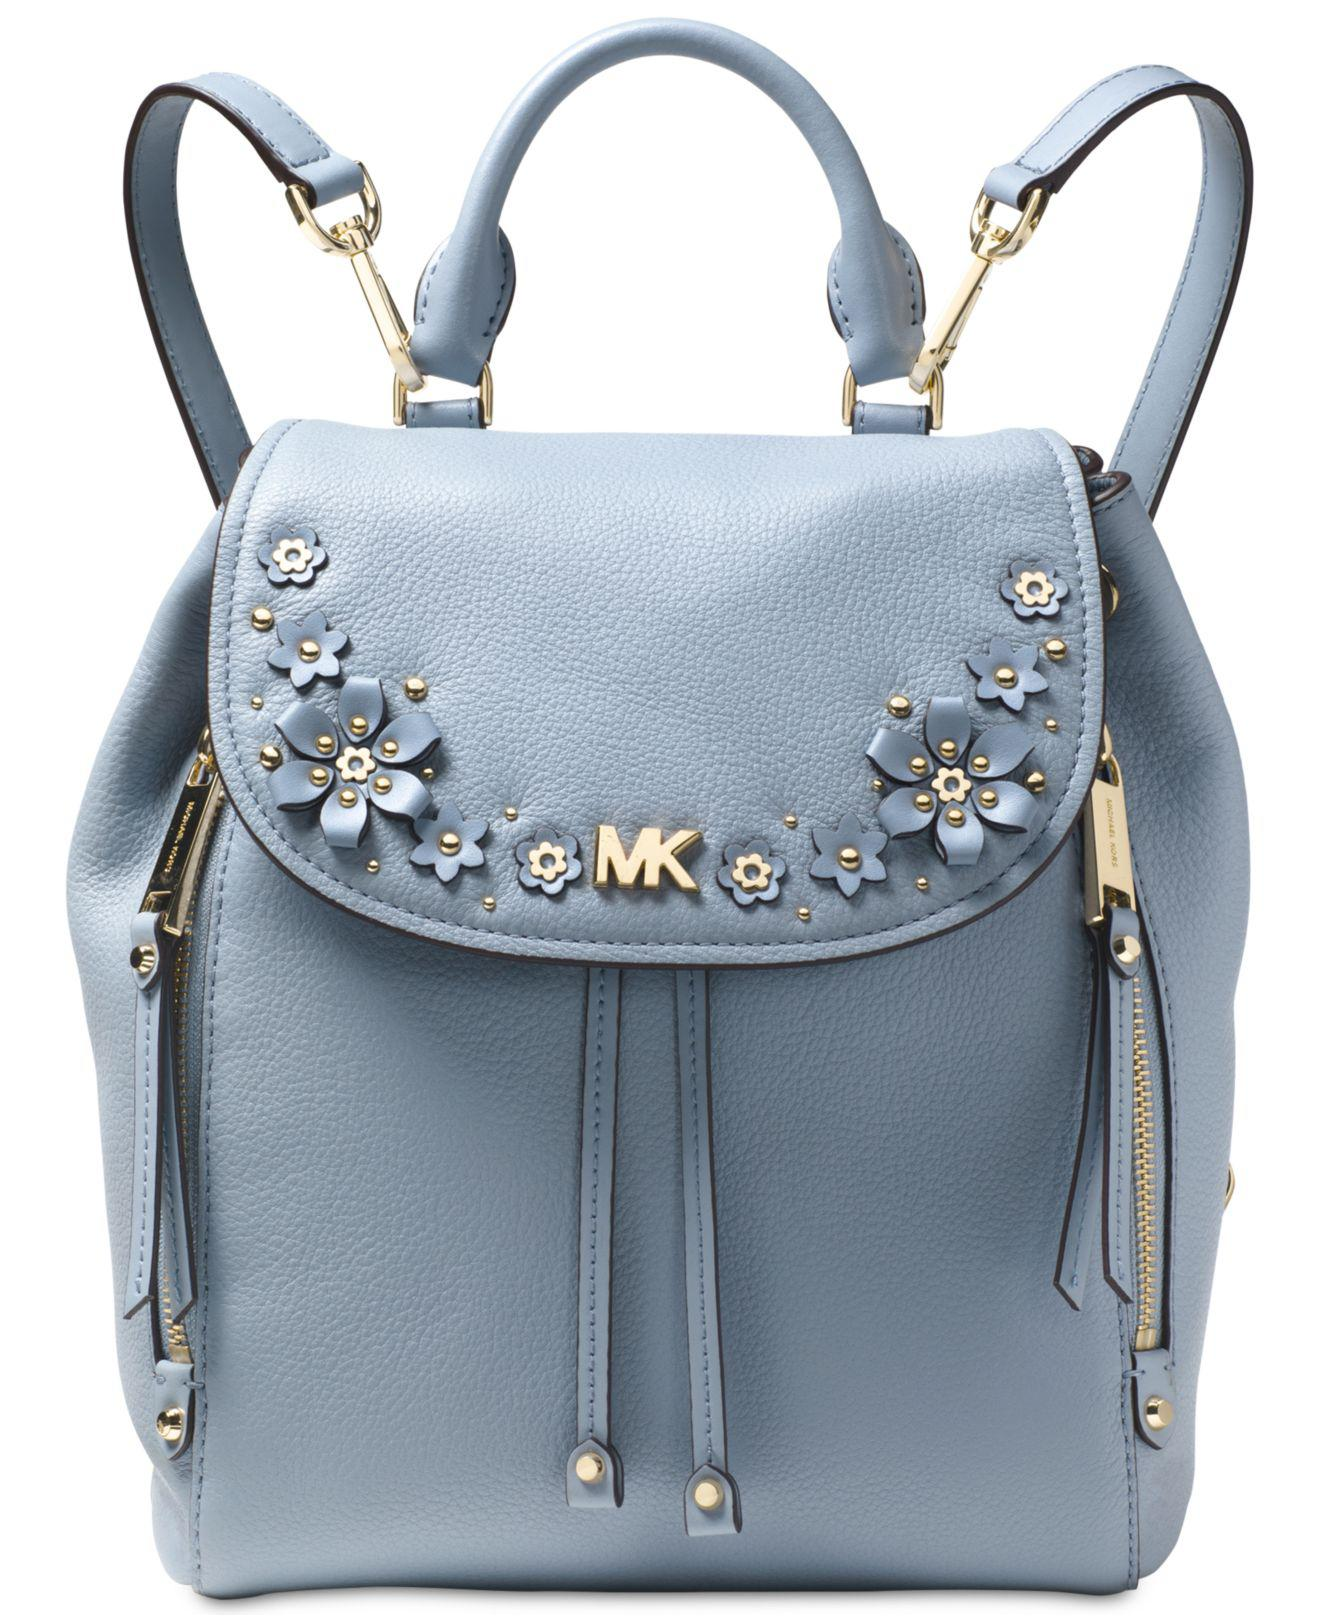 9fc0ce2b64fd australia michael kors mini backpack brown 8bb4e 3259d  where to buy michael  kors michael evie small flower garden backpack in blue lyst c0f5a d7c4d